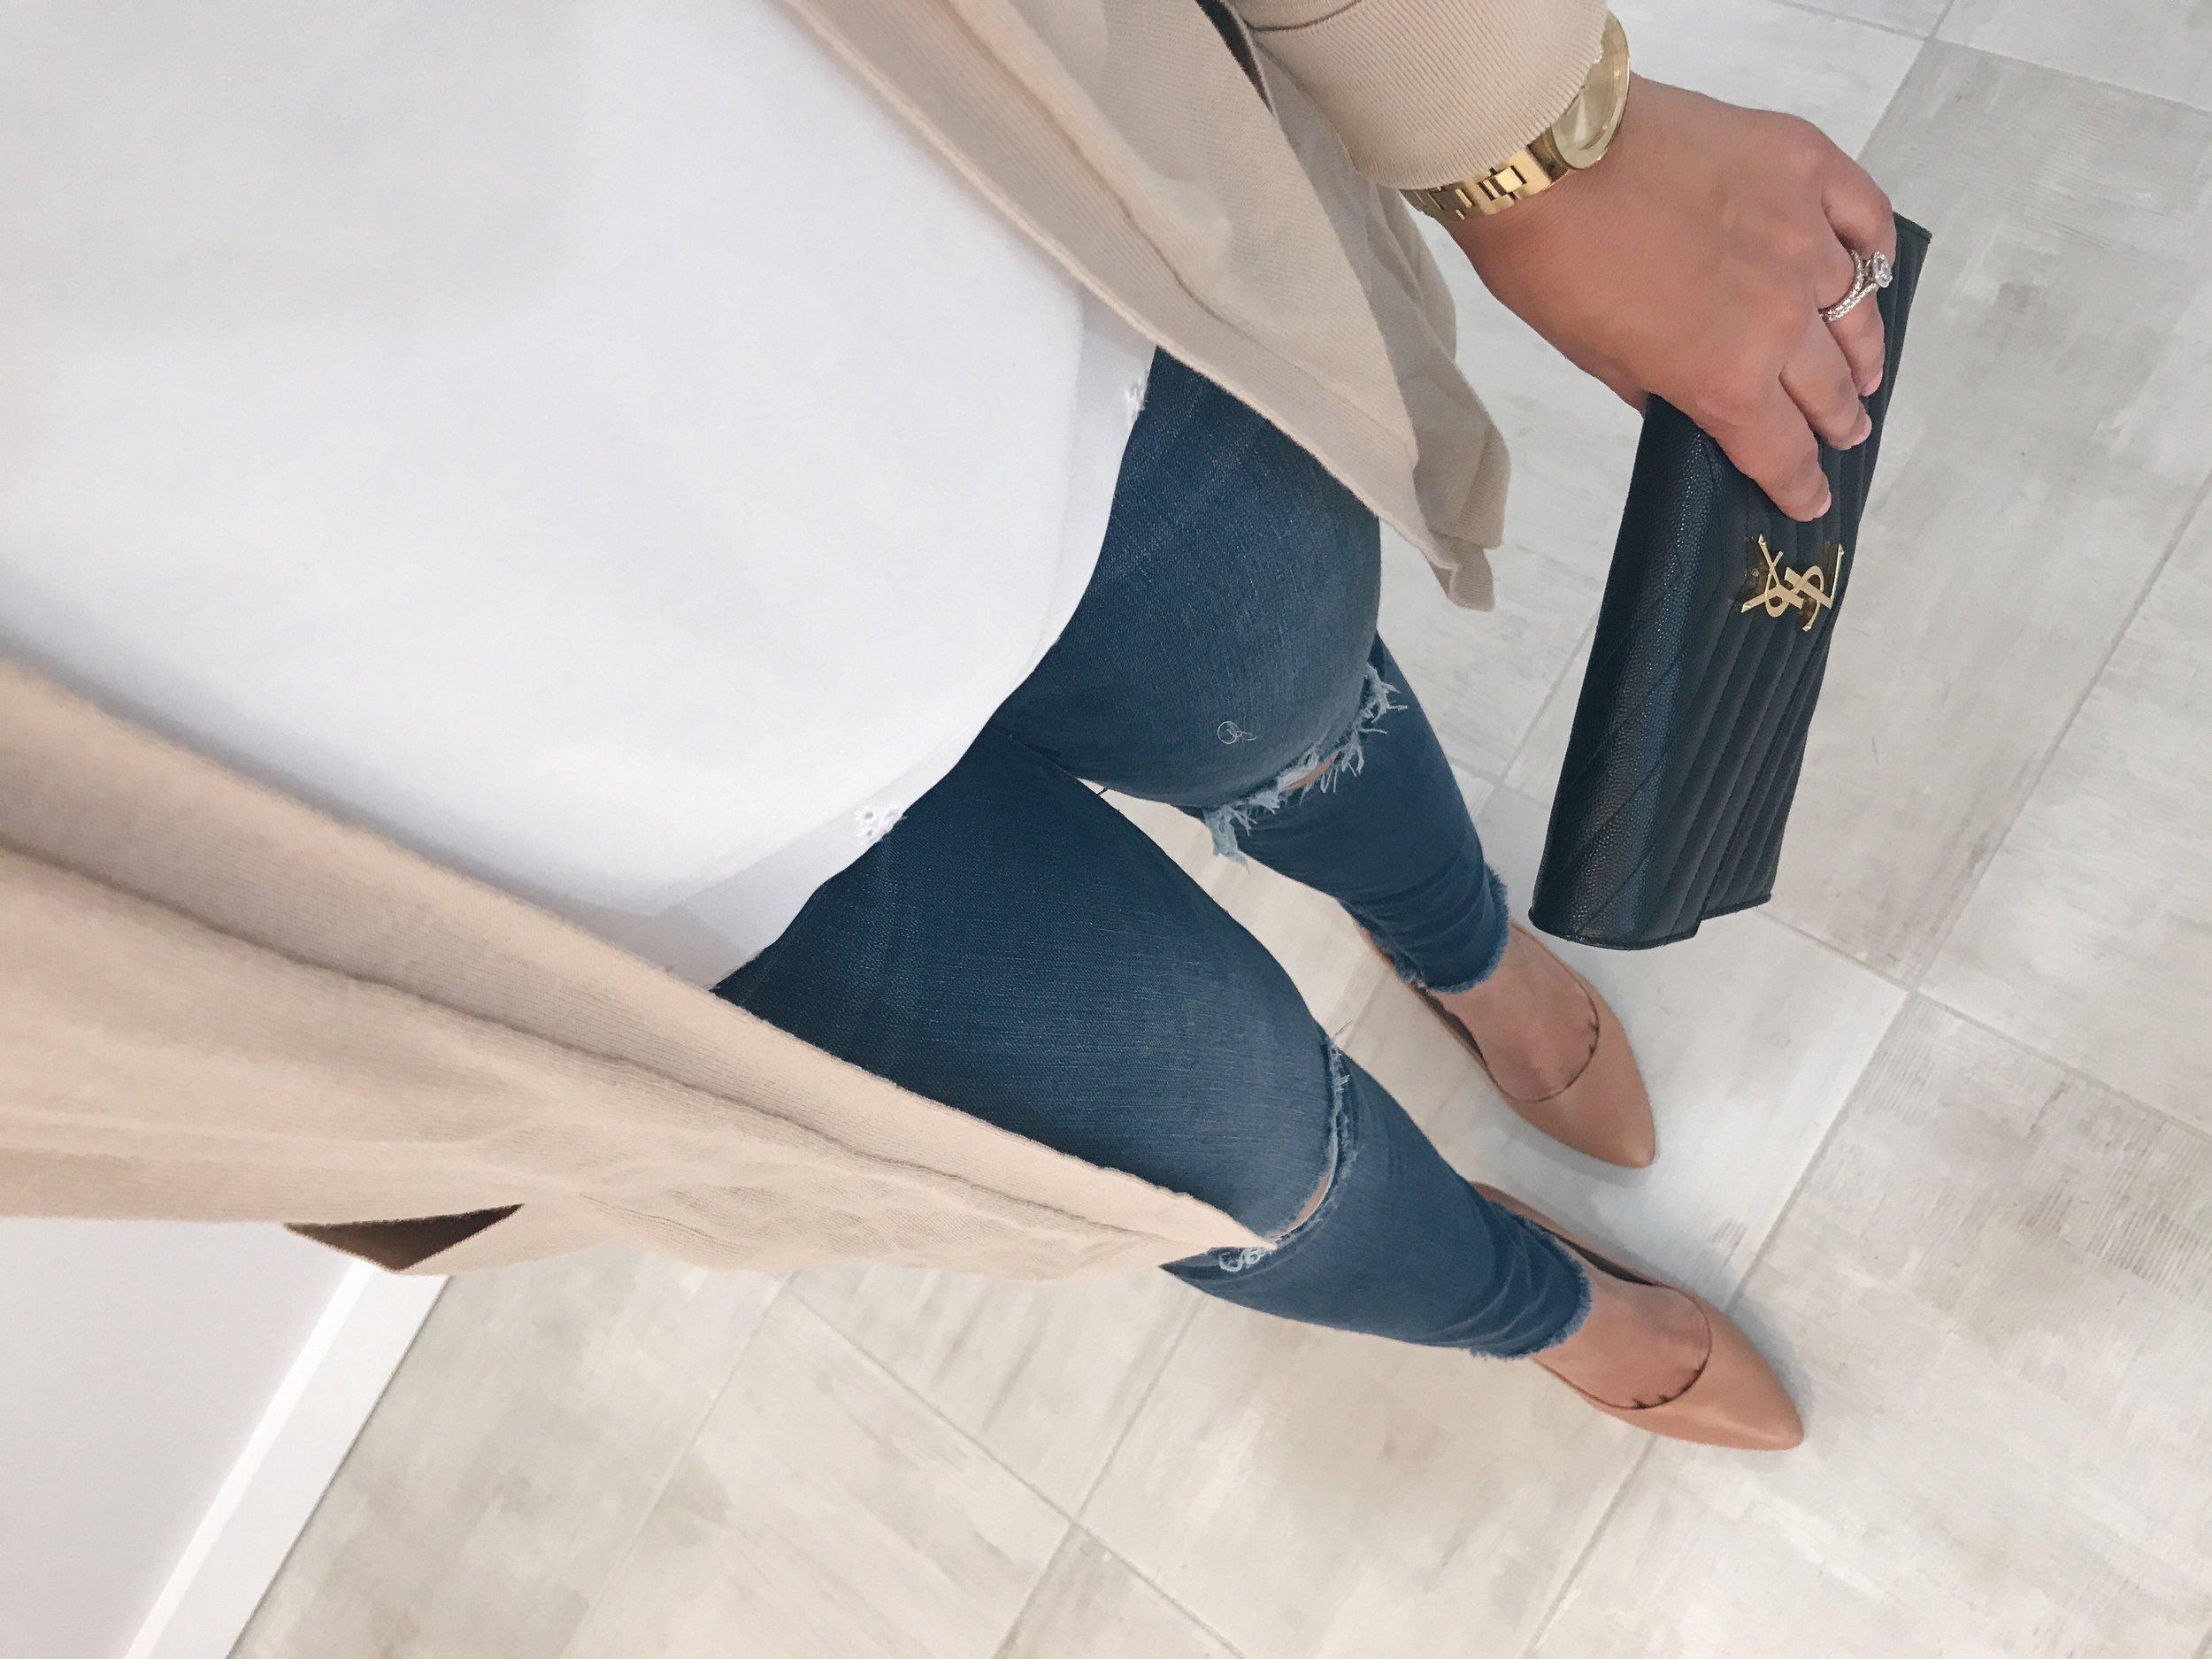 philadelphia-fashion-blogger-fall-outfit-inspiration.jpg